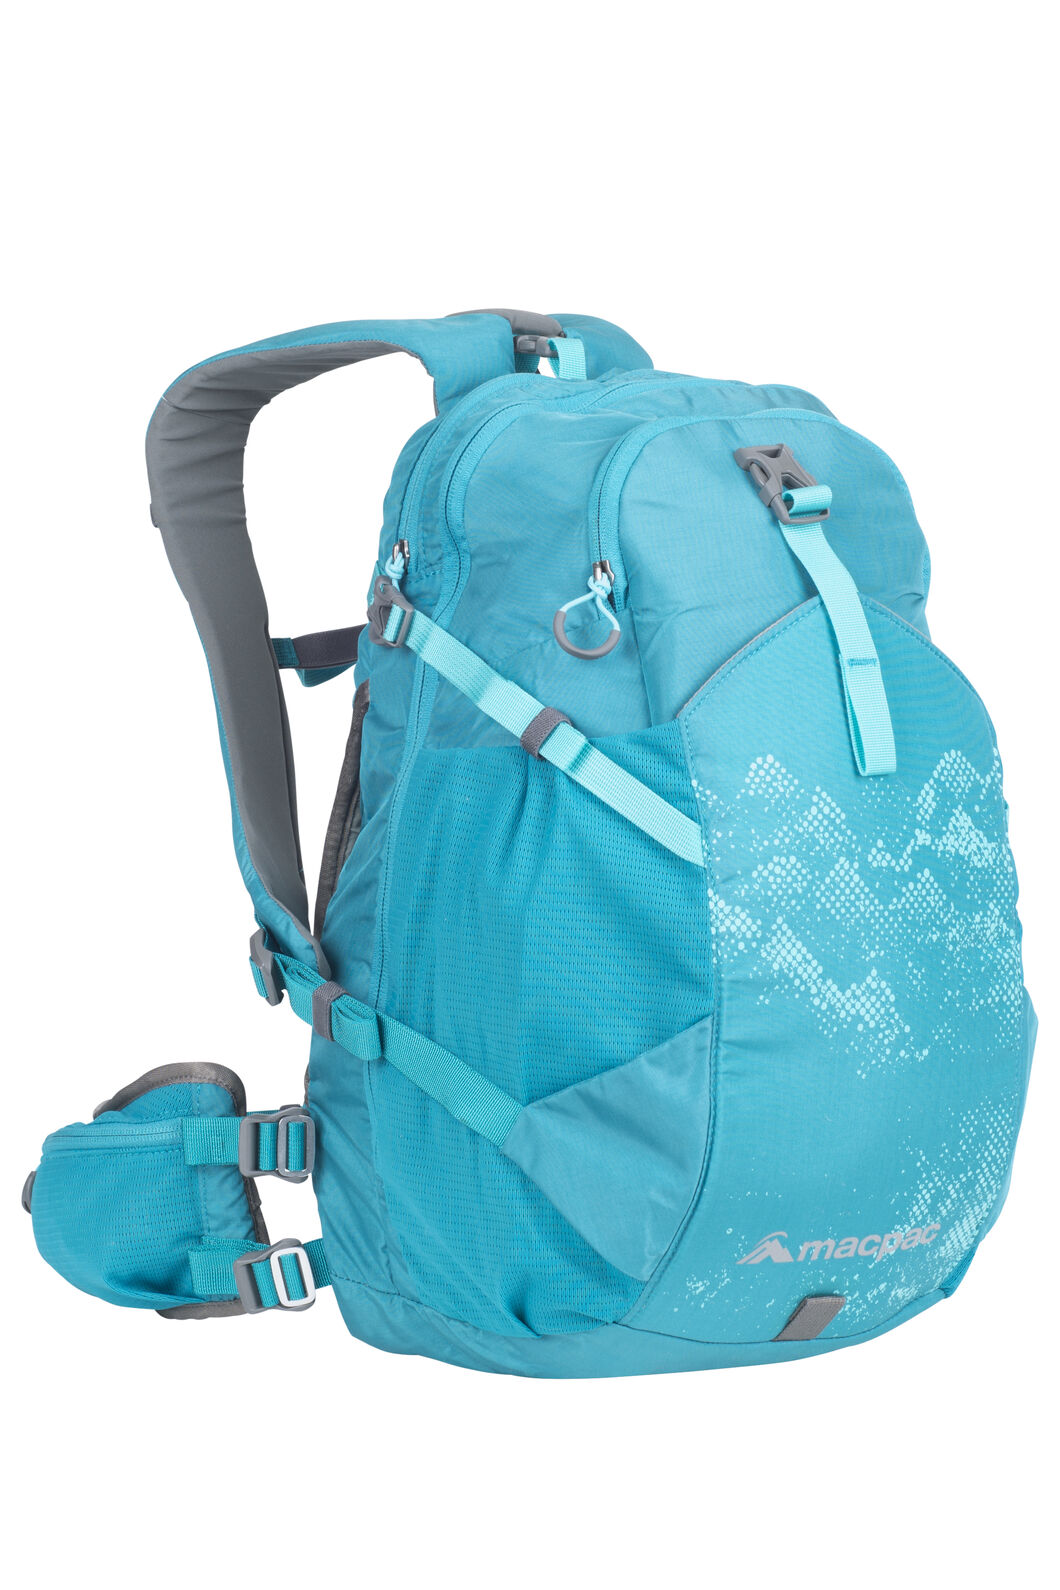 Mountain Bike 18L Pack, Enamel Blue, hi-res